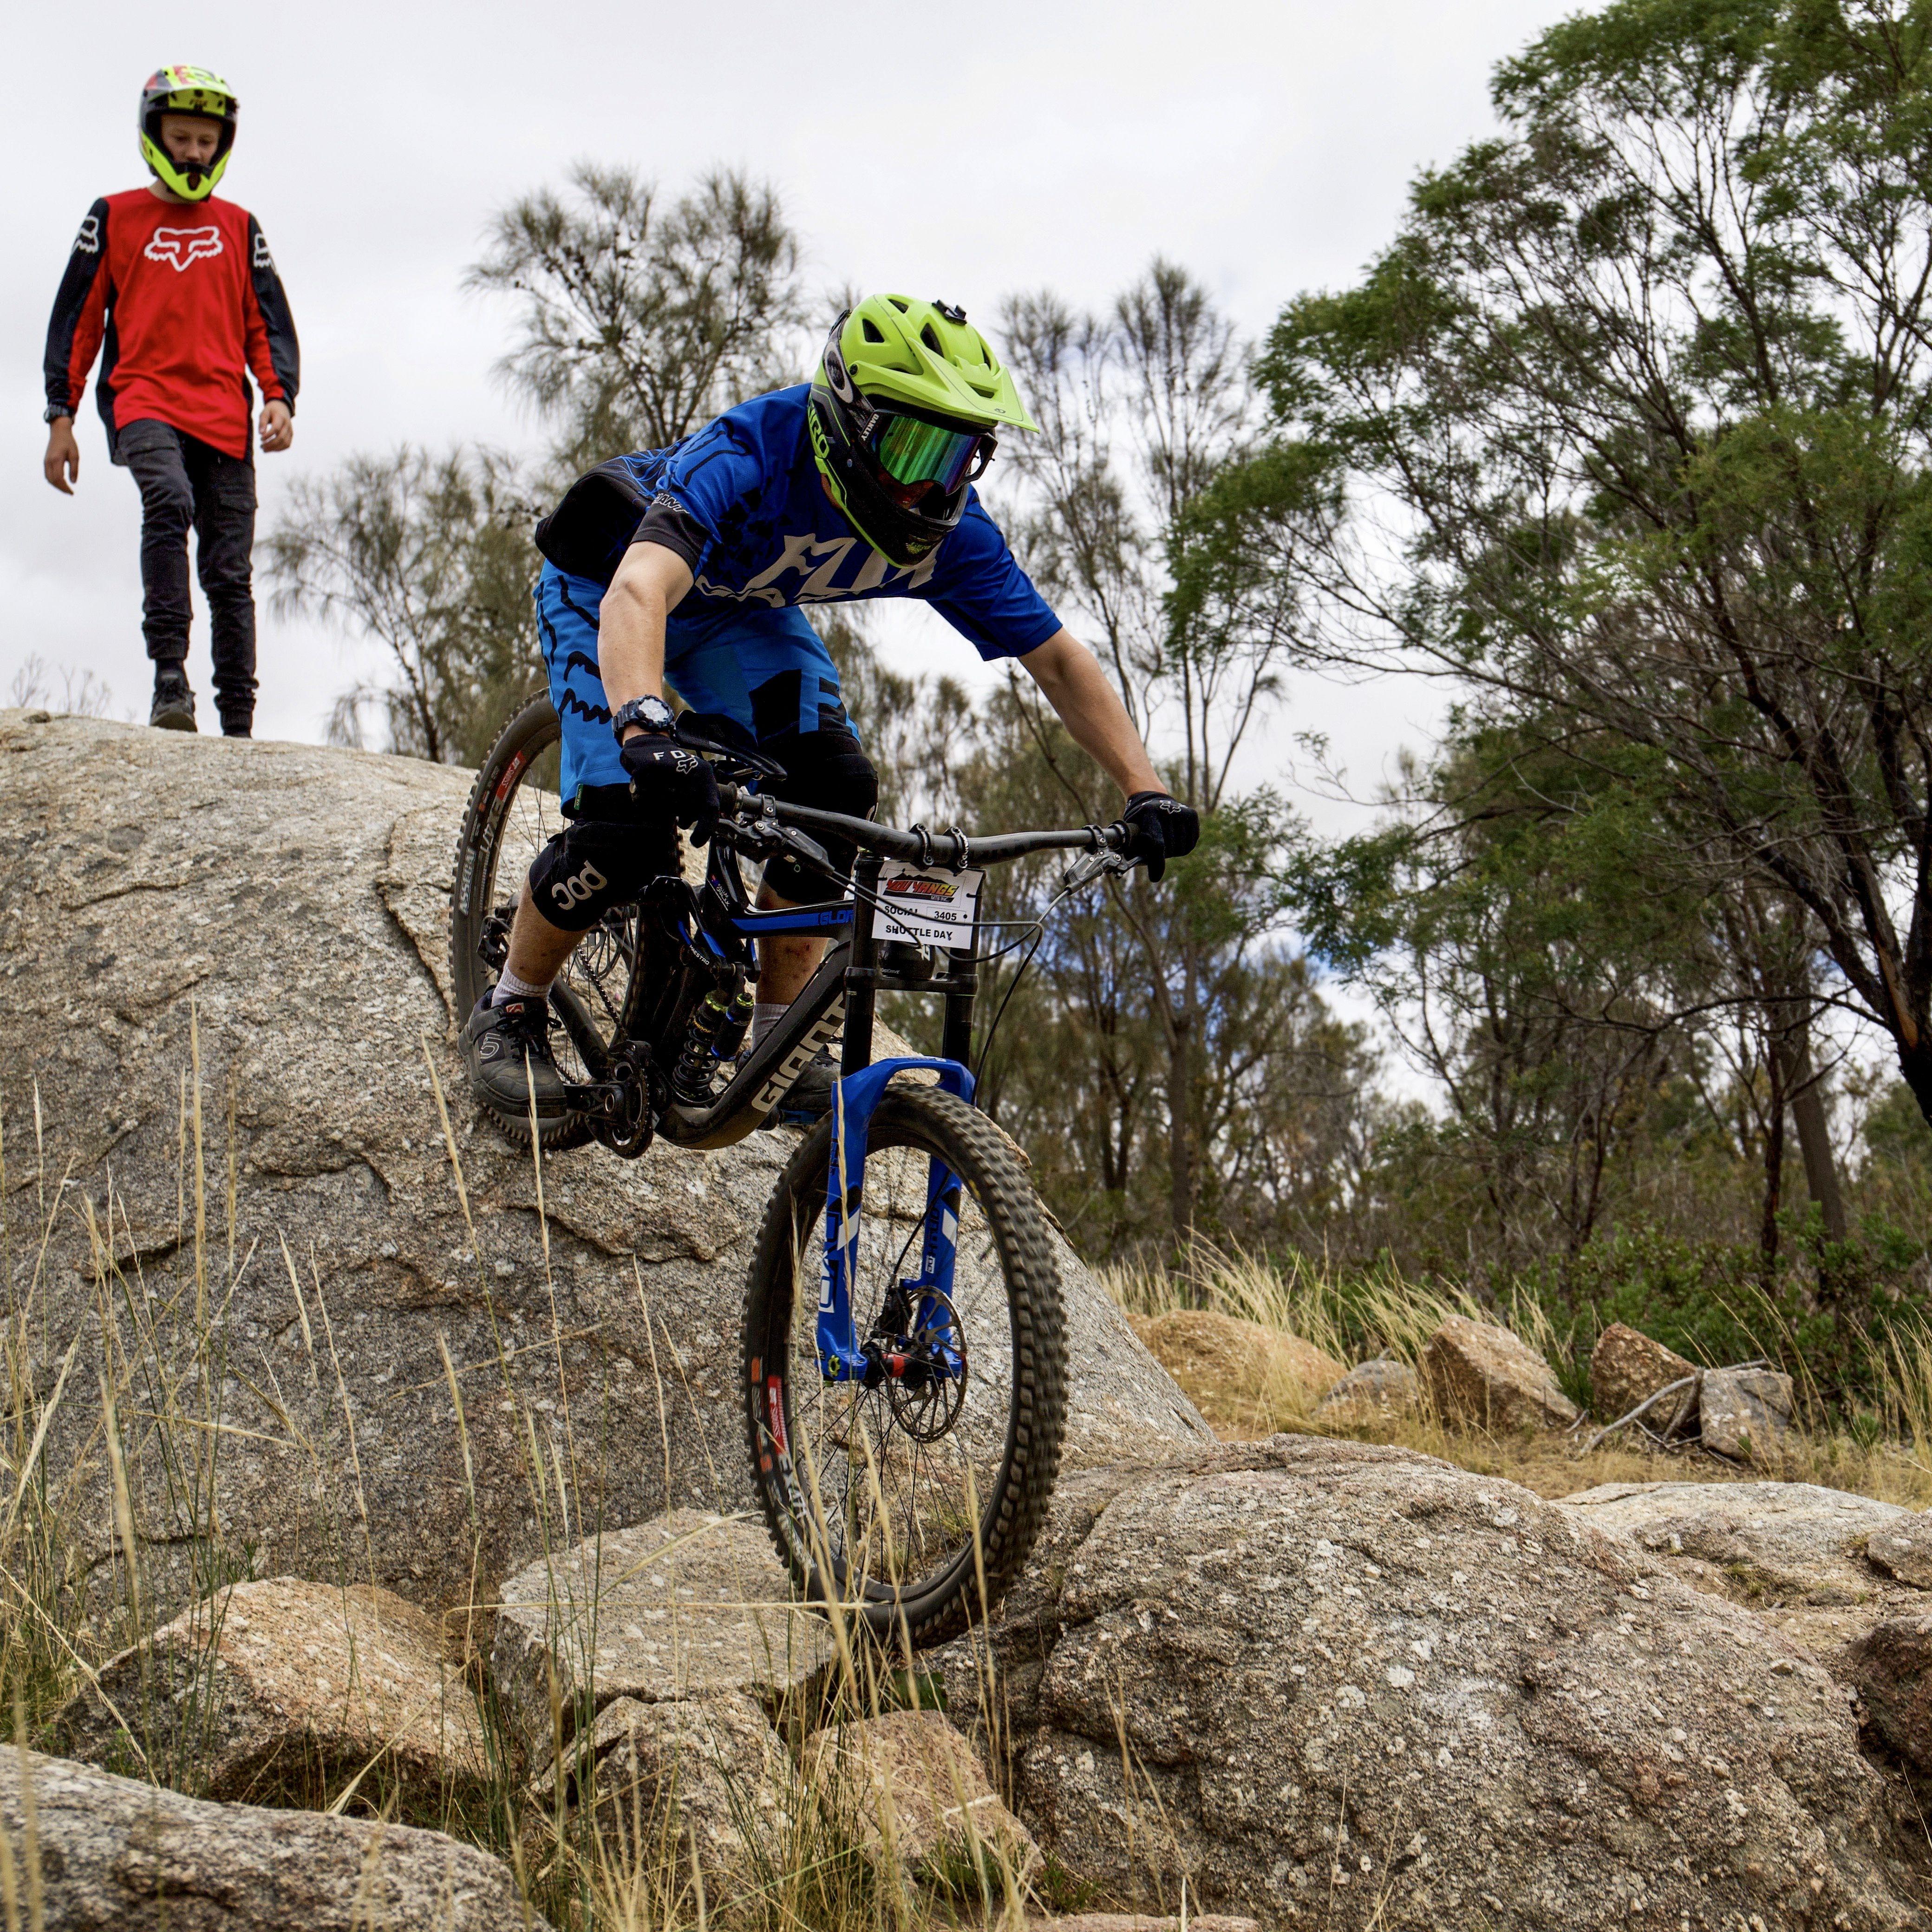 Pin By Dean Rainford On You Yangs Mtb In 2020 Bike Parking Mtb